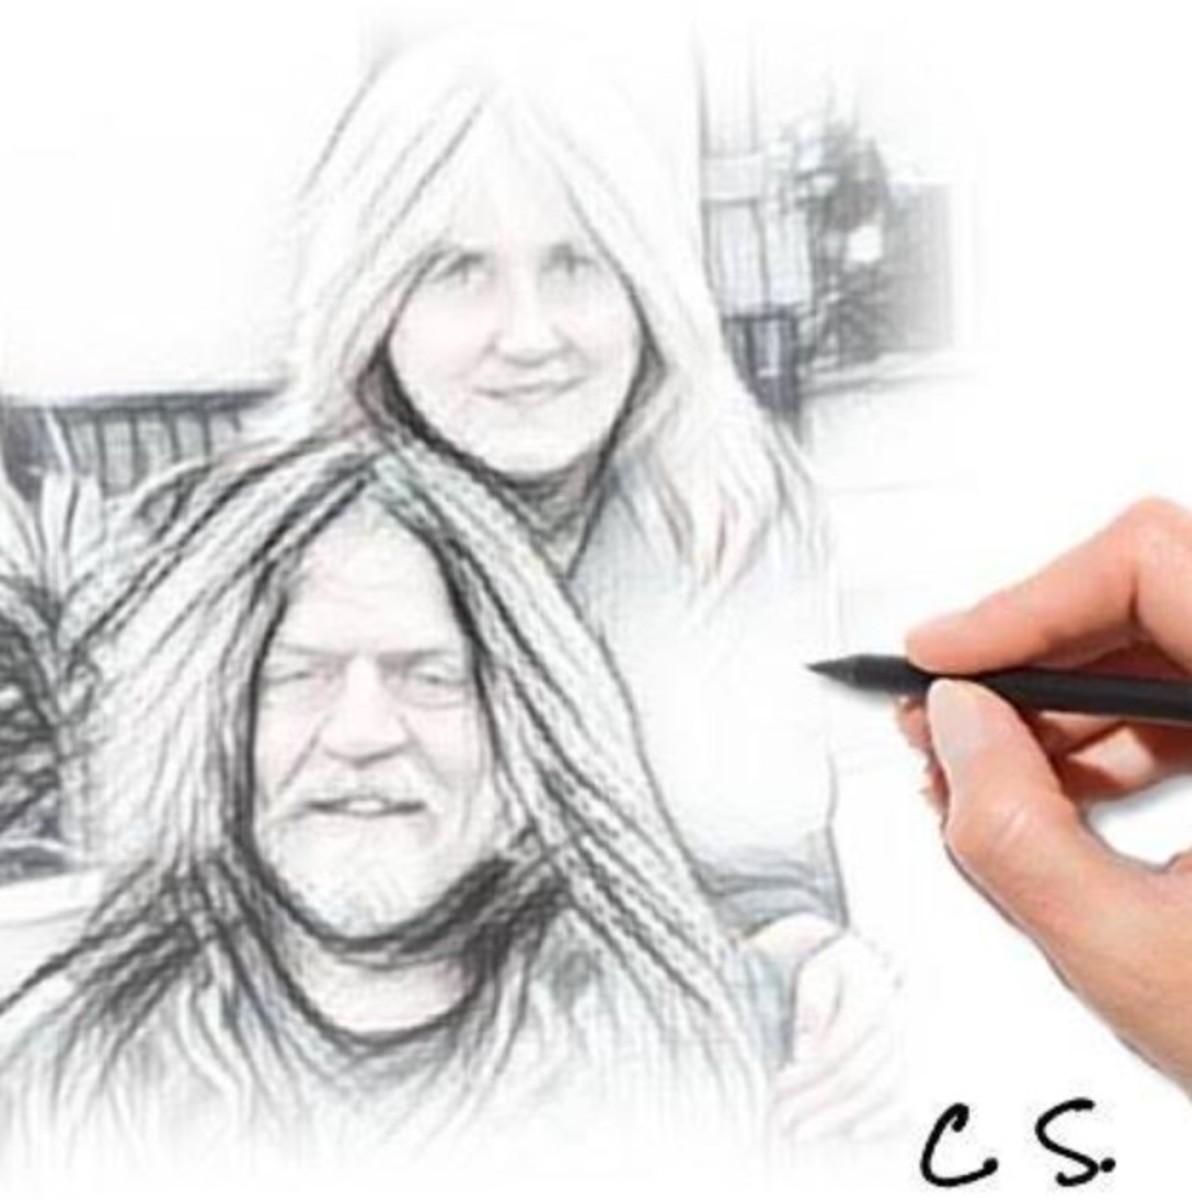 Robby and Cindy Steinhardt sketch, courtesy of Cindy Steinhardt, Facebook